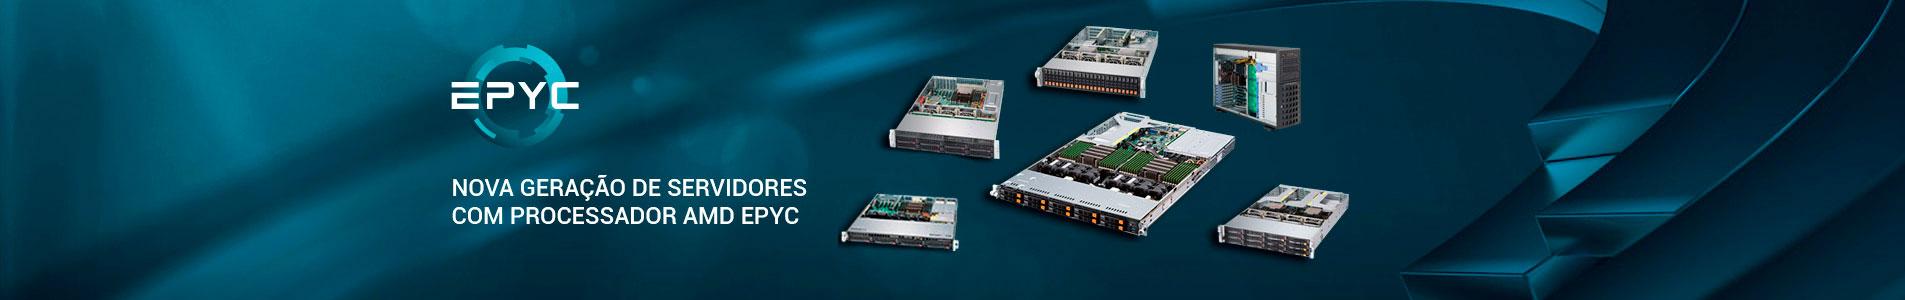 servidor-nexus-amd-epyc-7000-processador